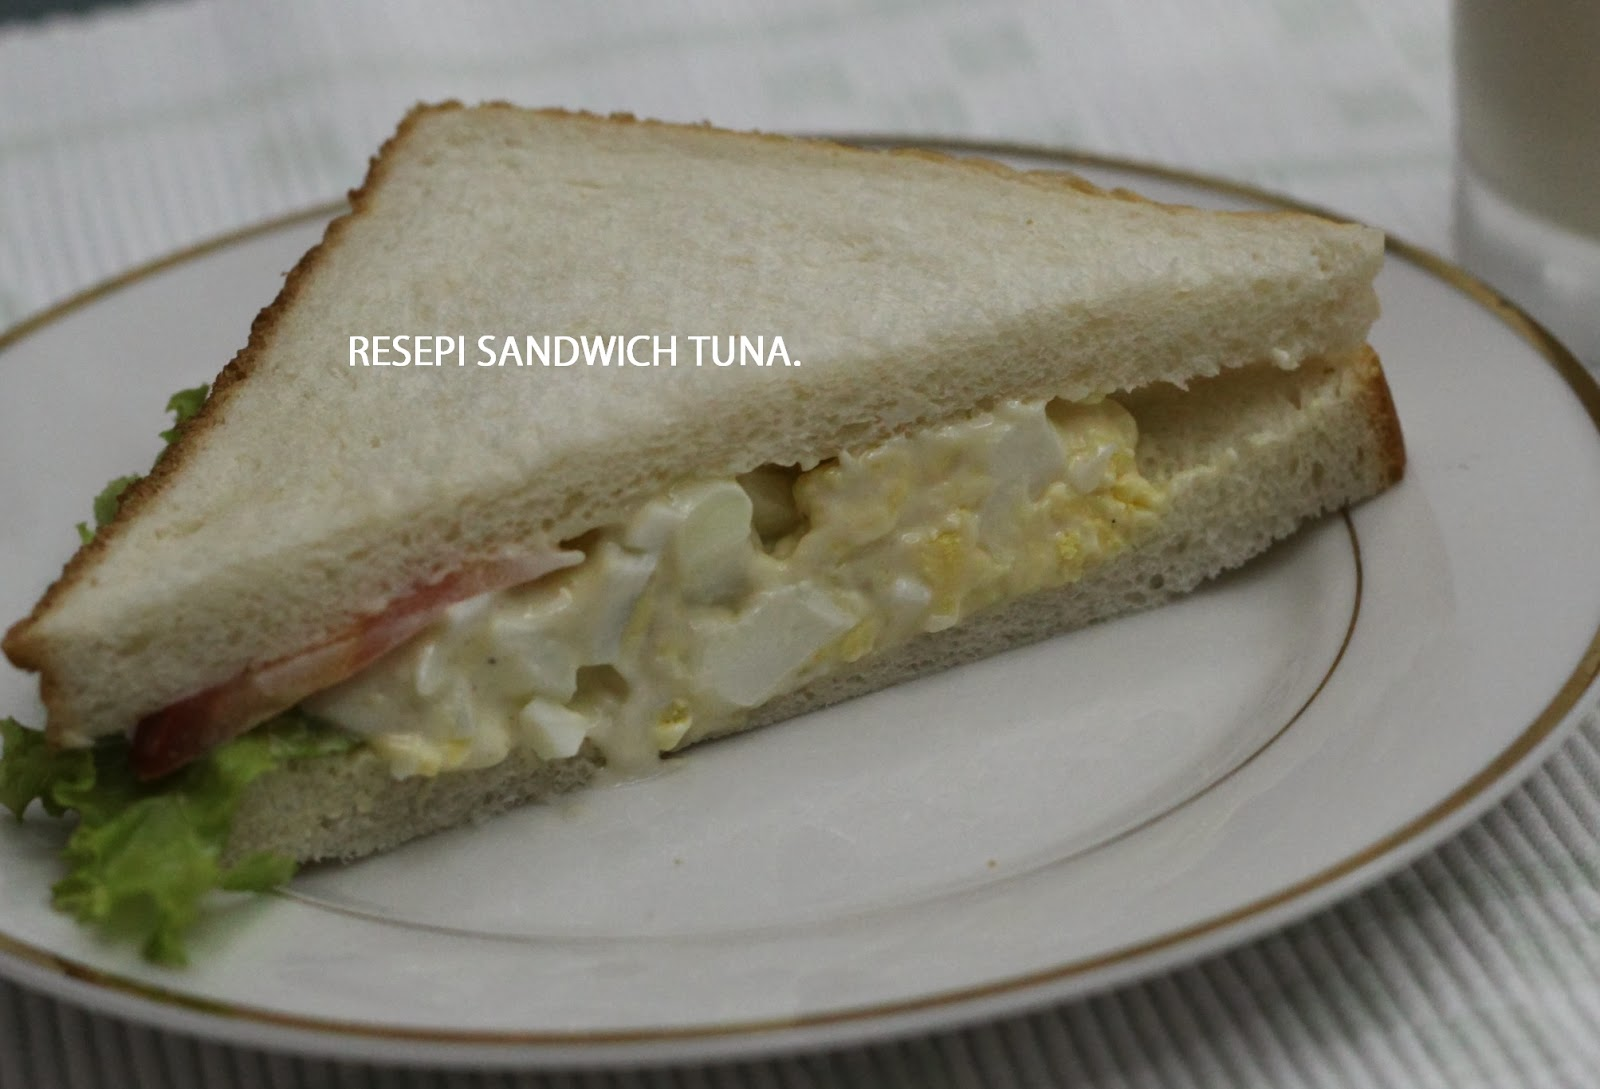 Resepi, Sandwich Tuna